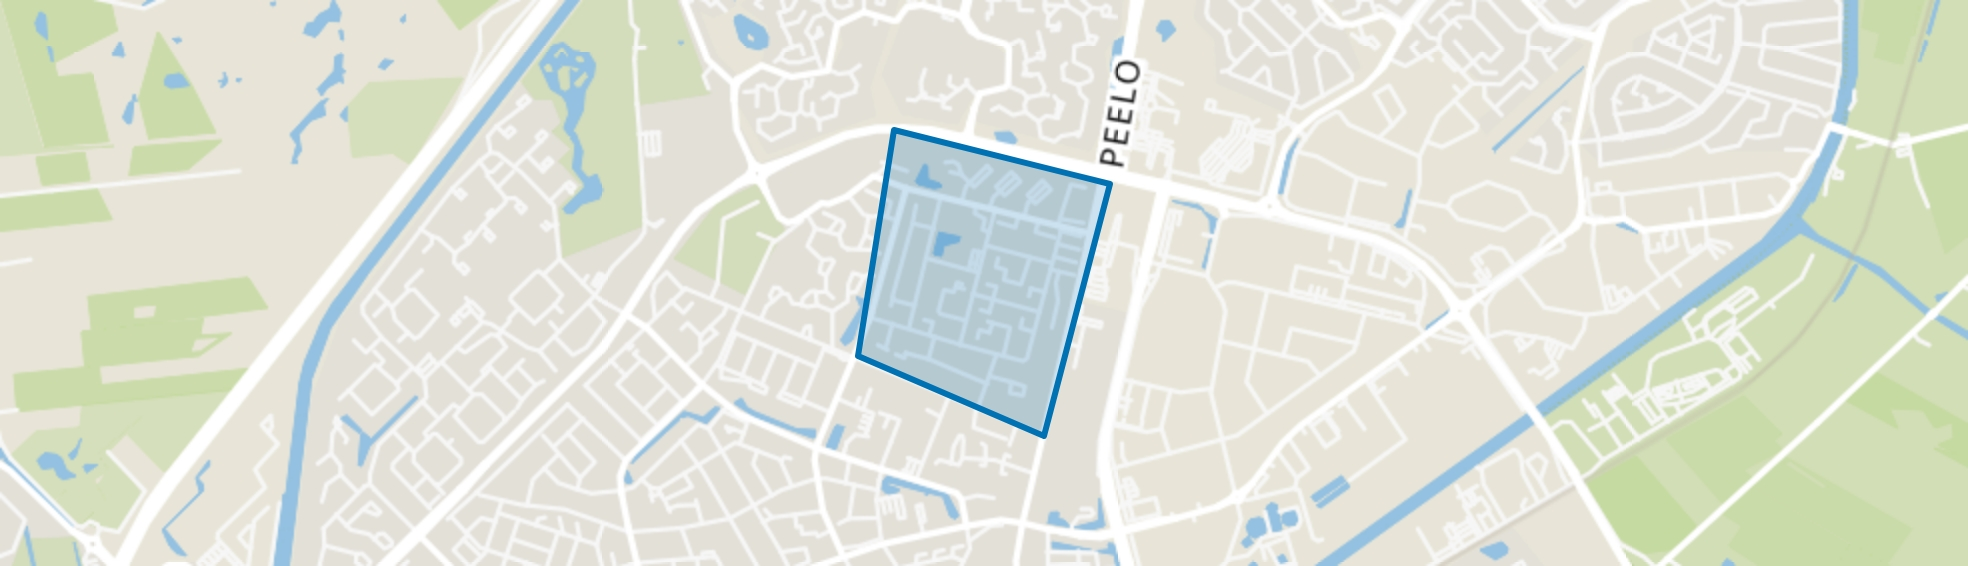 Componistenbuurt Oost, Assen map